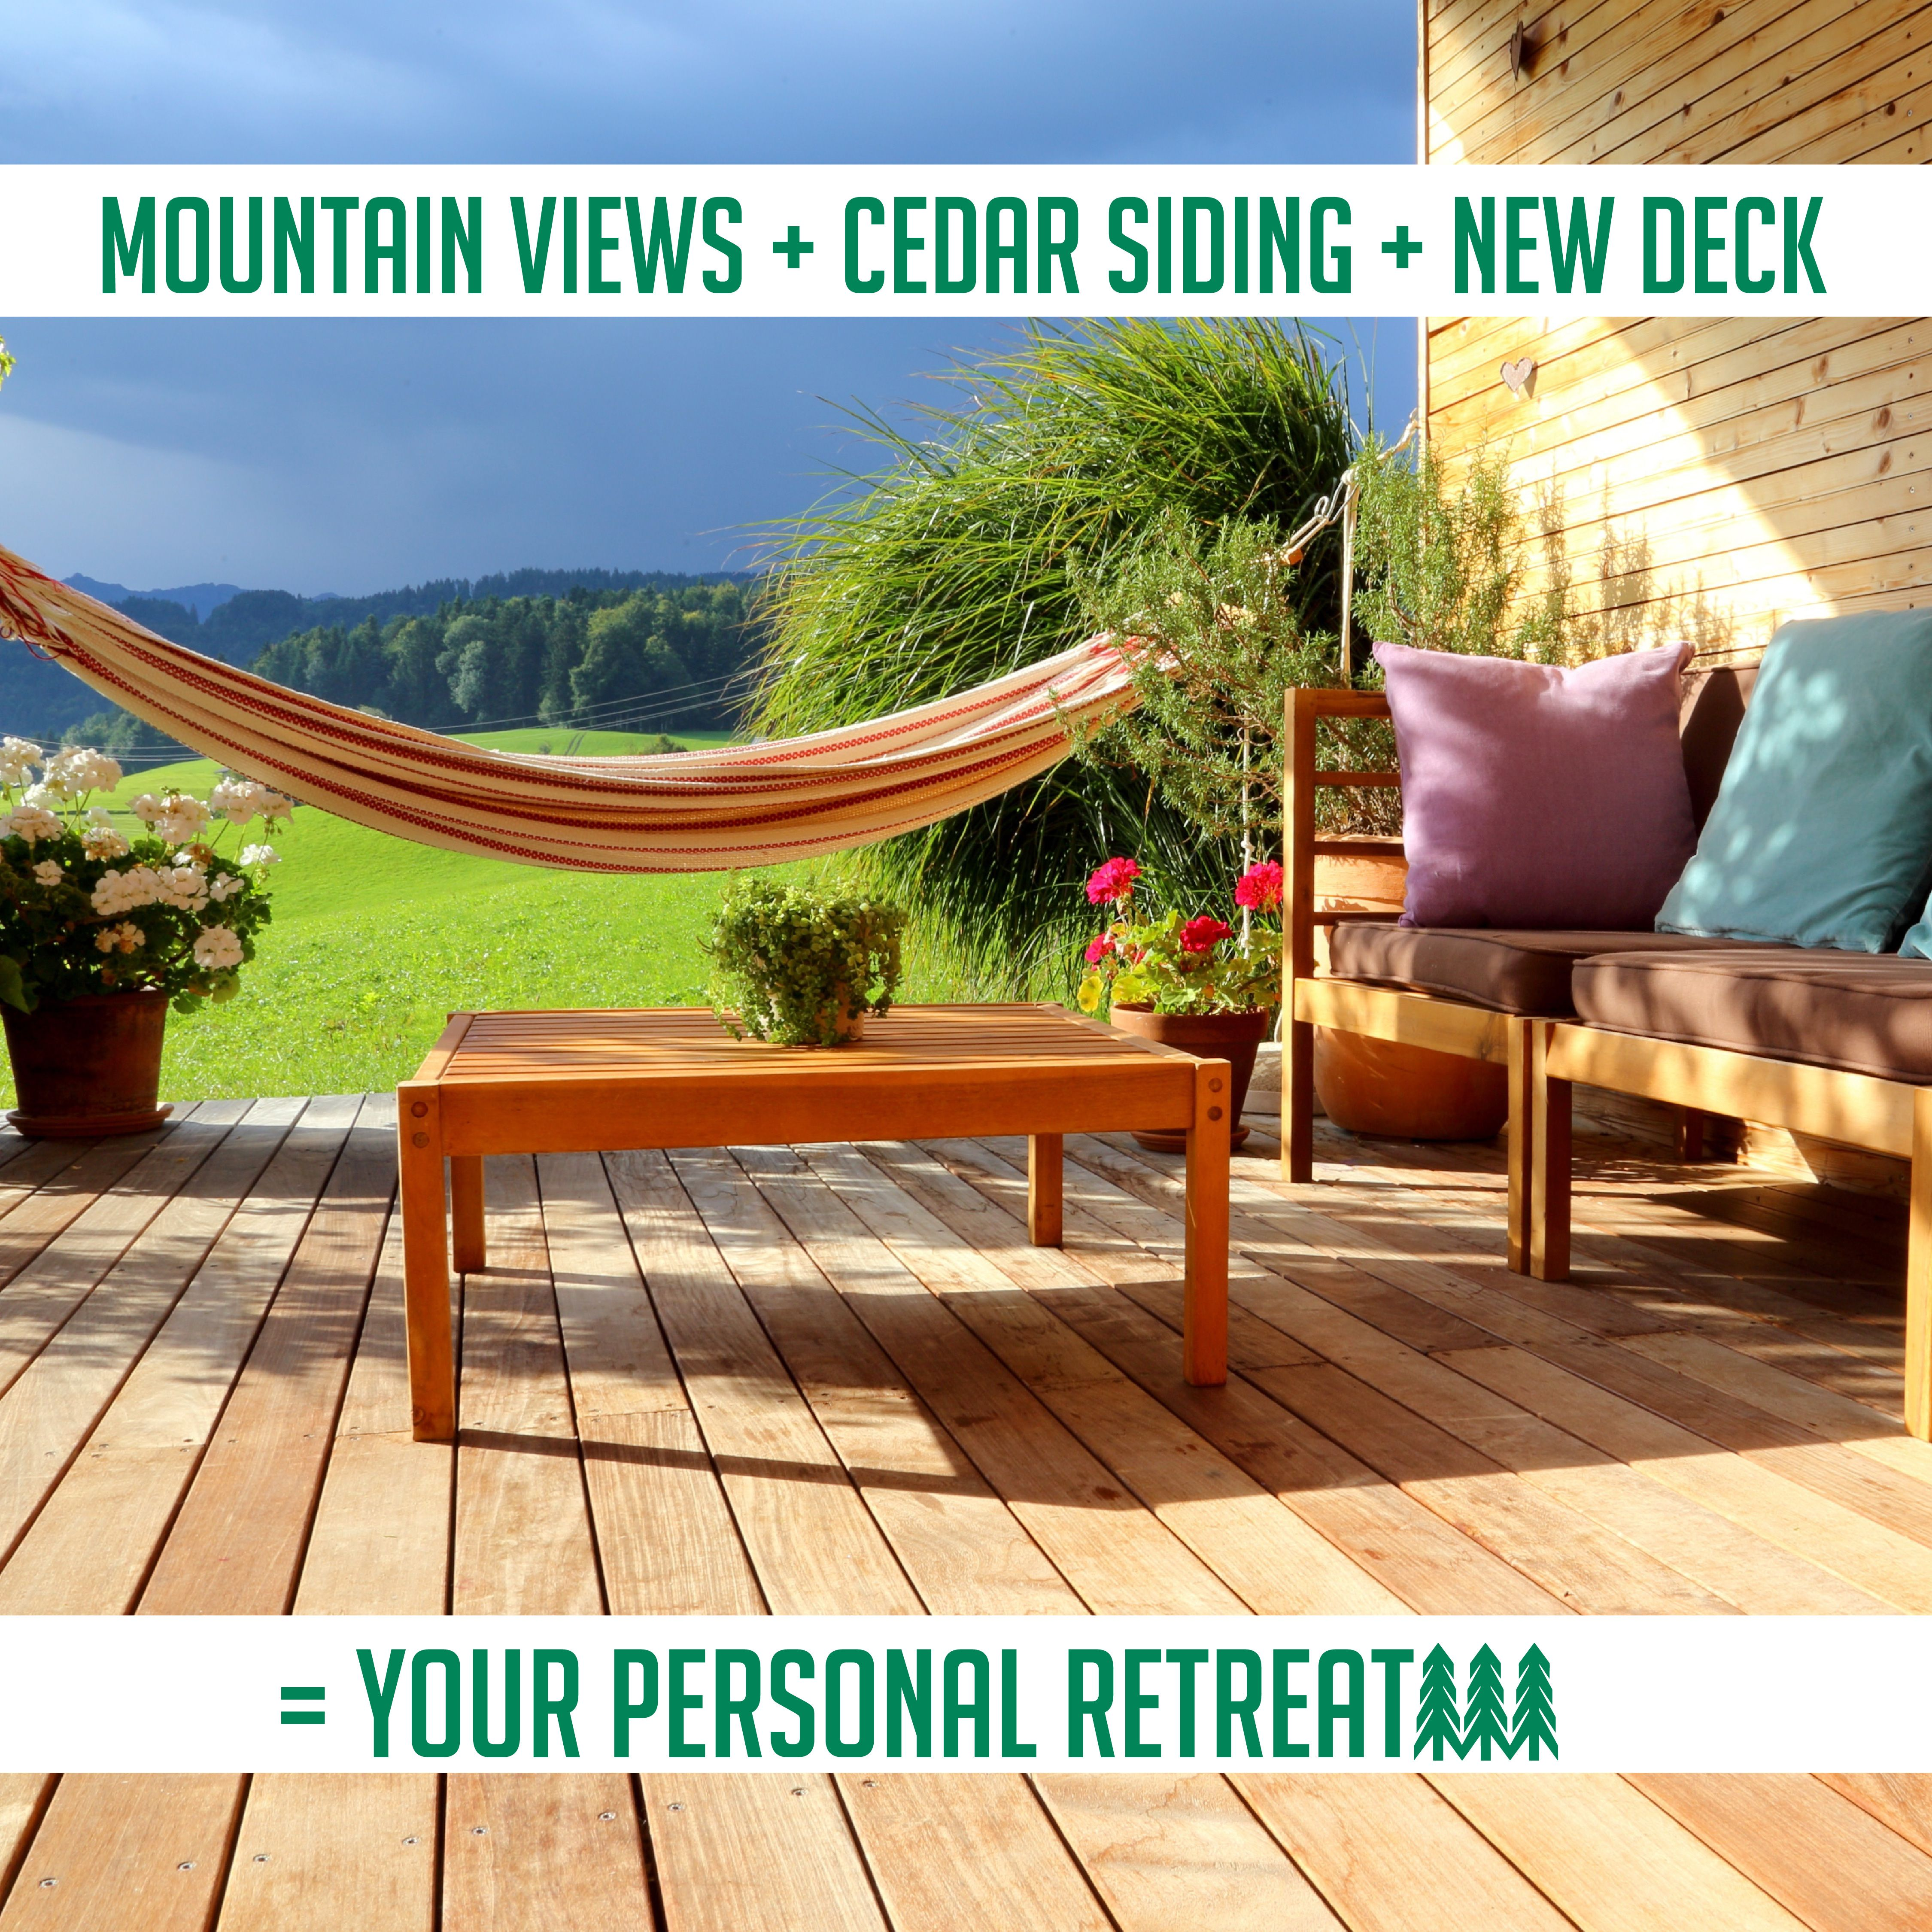 Denver Wooden Siding Materials Cedar Siding Supplies Cedar Siding Deck Views Siding